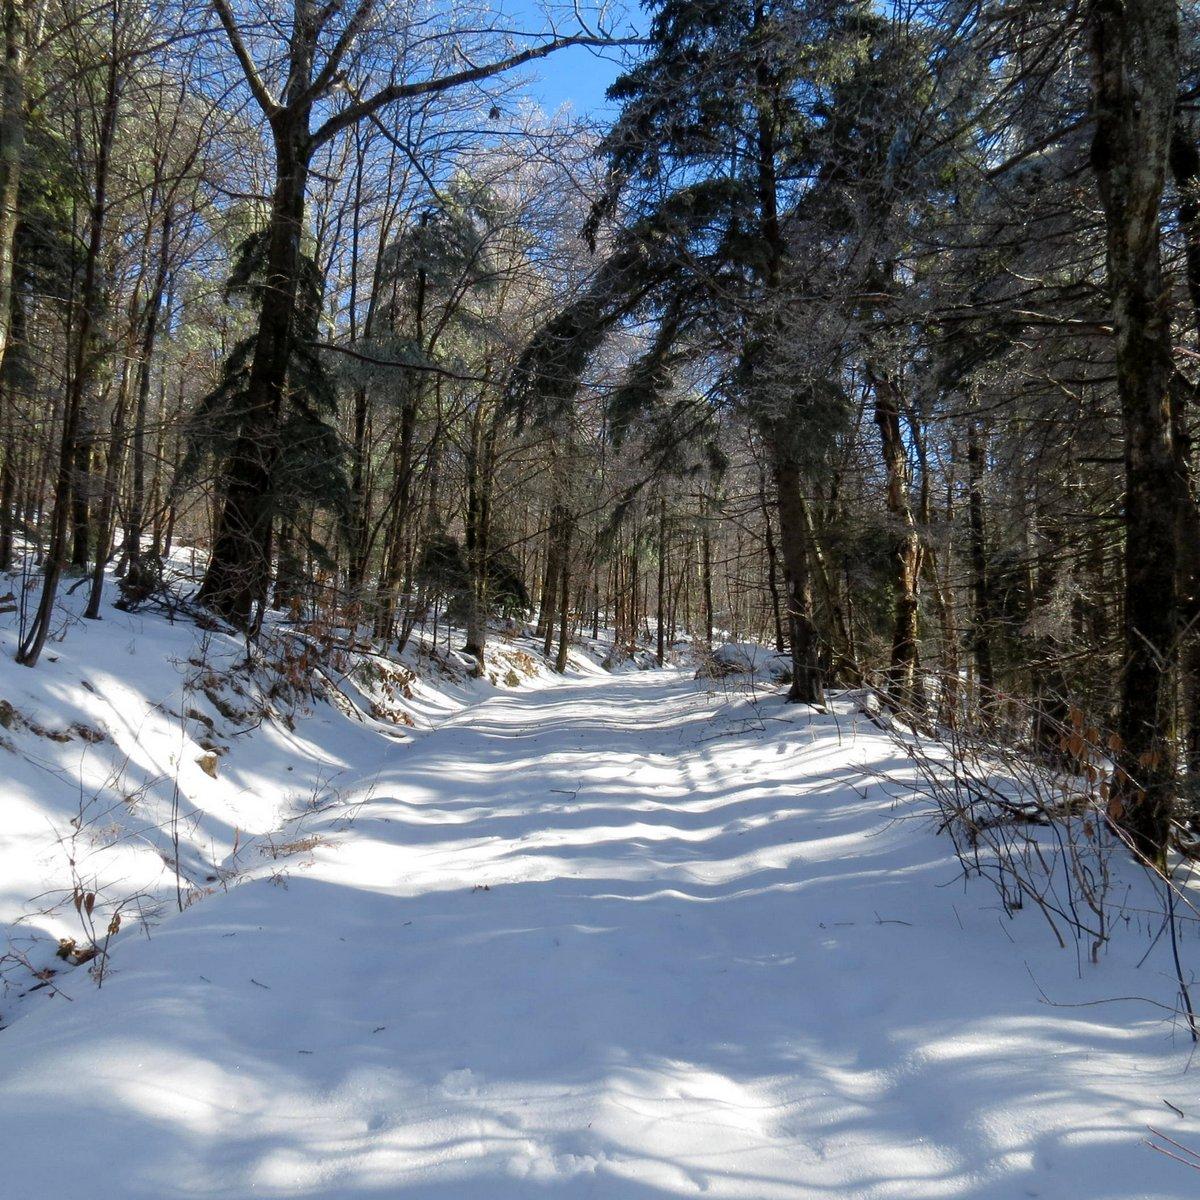 2. Trail